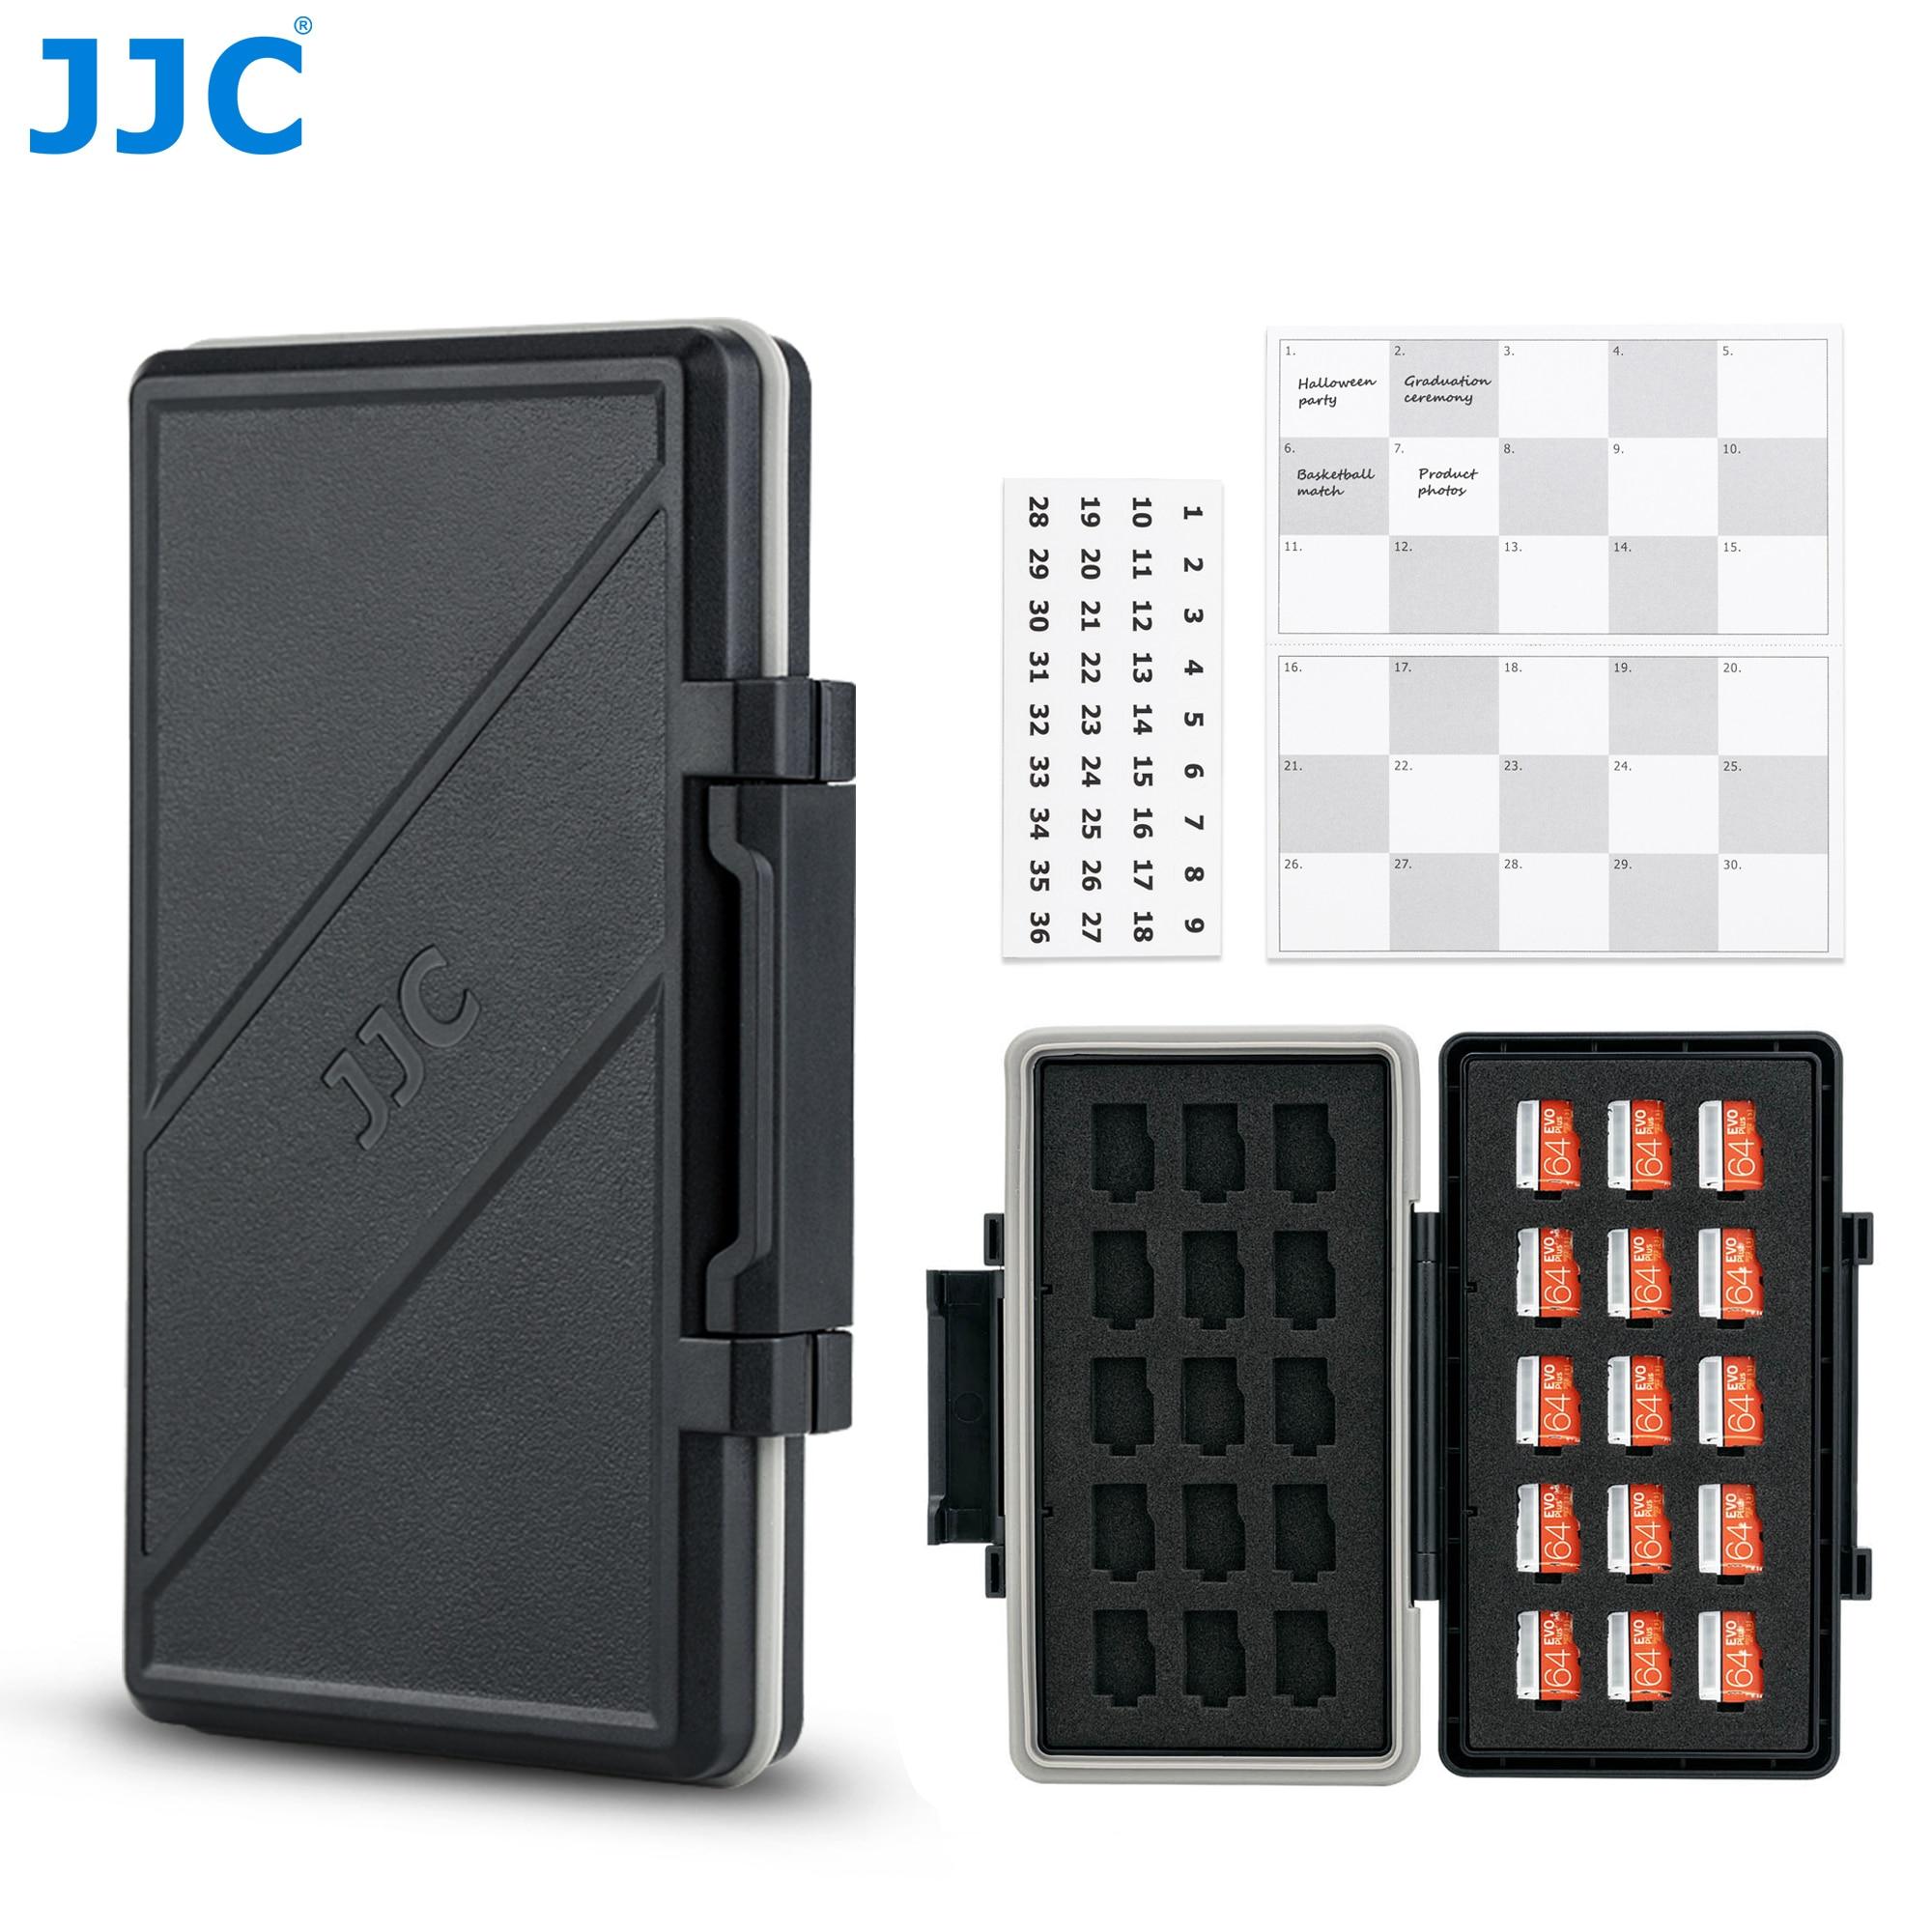 JJC 30 Slot Memory Card Case Wallet Holder Organizer for Micro SD Micro SDHC Micro SDXC TF MSD Card Storage Box Keeper Protector